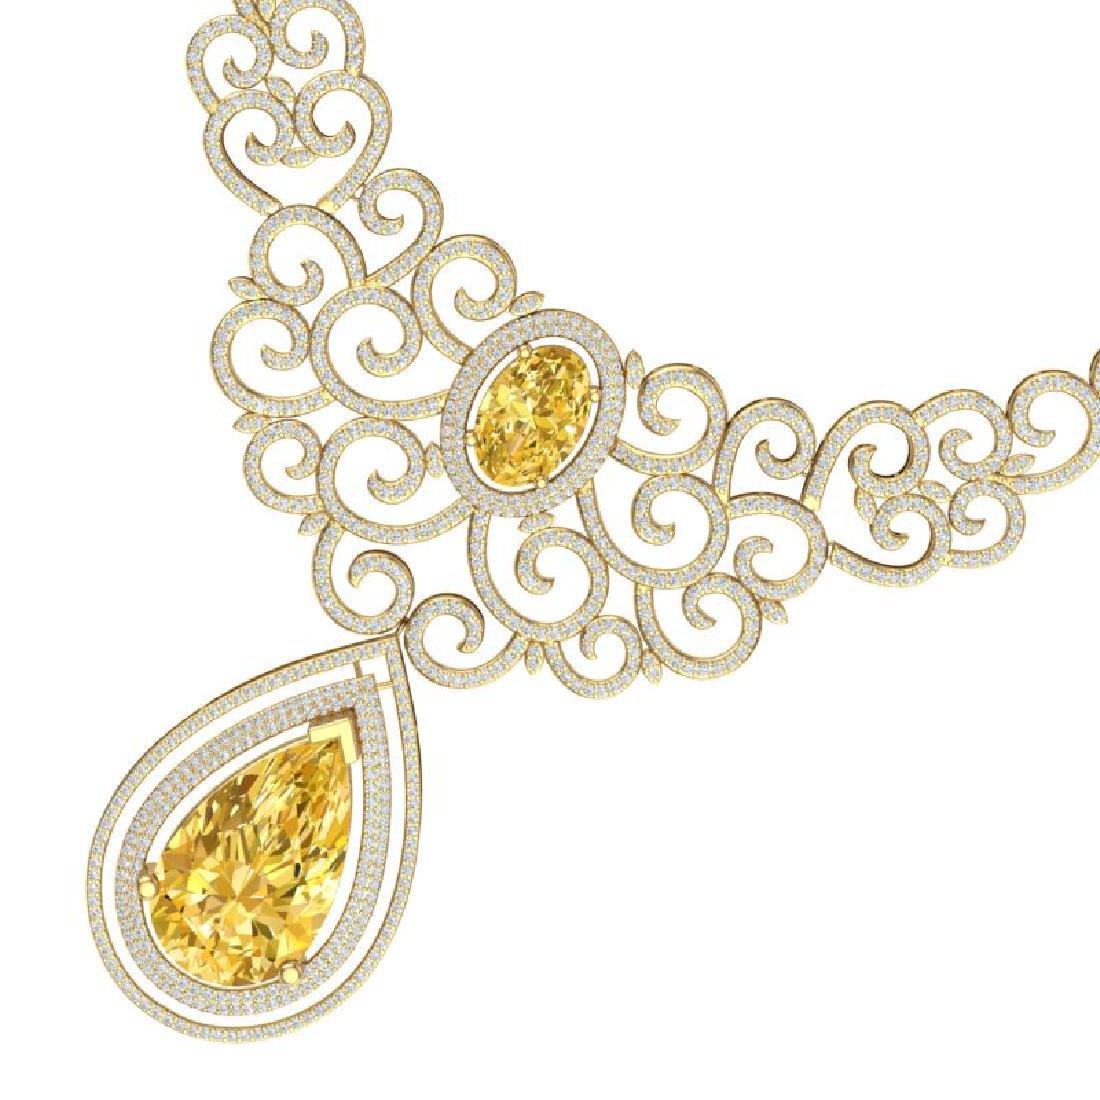 73.43 CTW Royalty Canary Citrine & VS Diamond Necklace